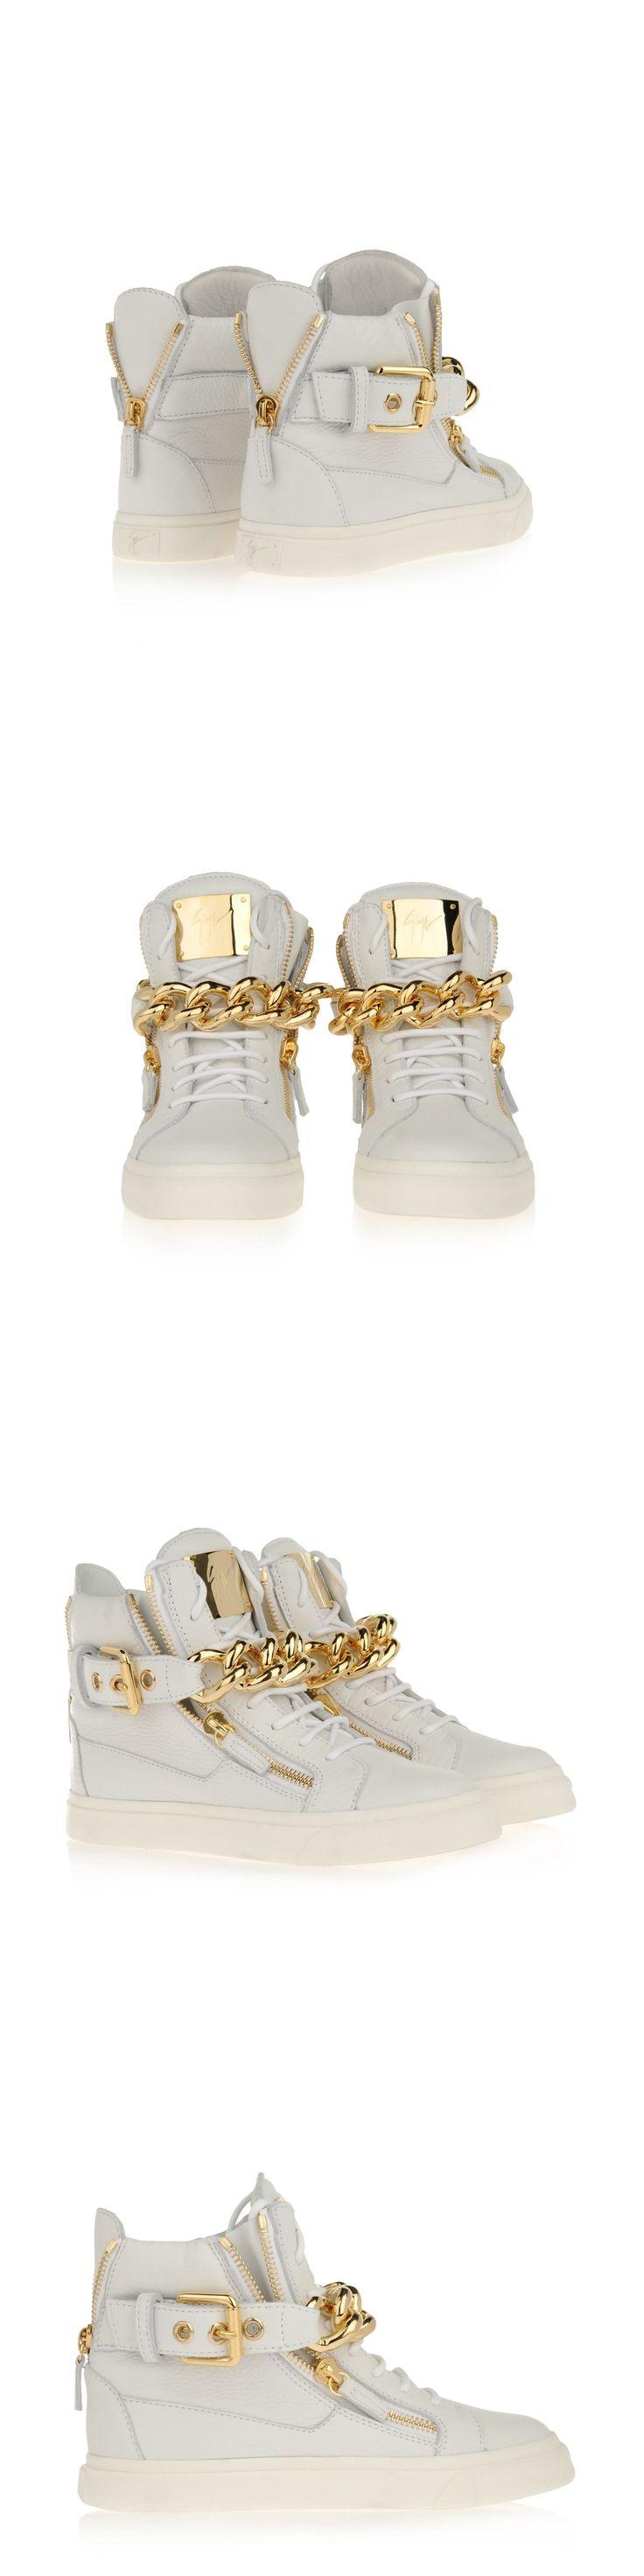 Giuseppe Zanotti - Sneakers - RDW340 005